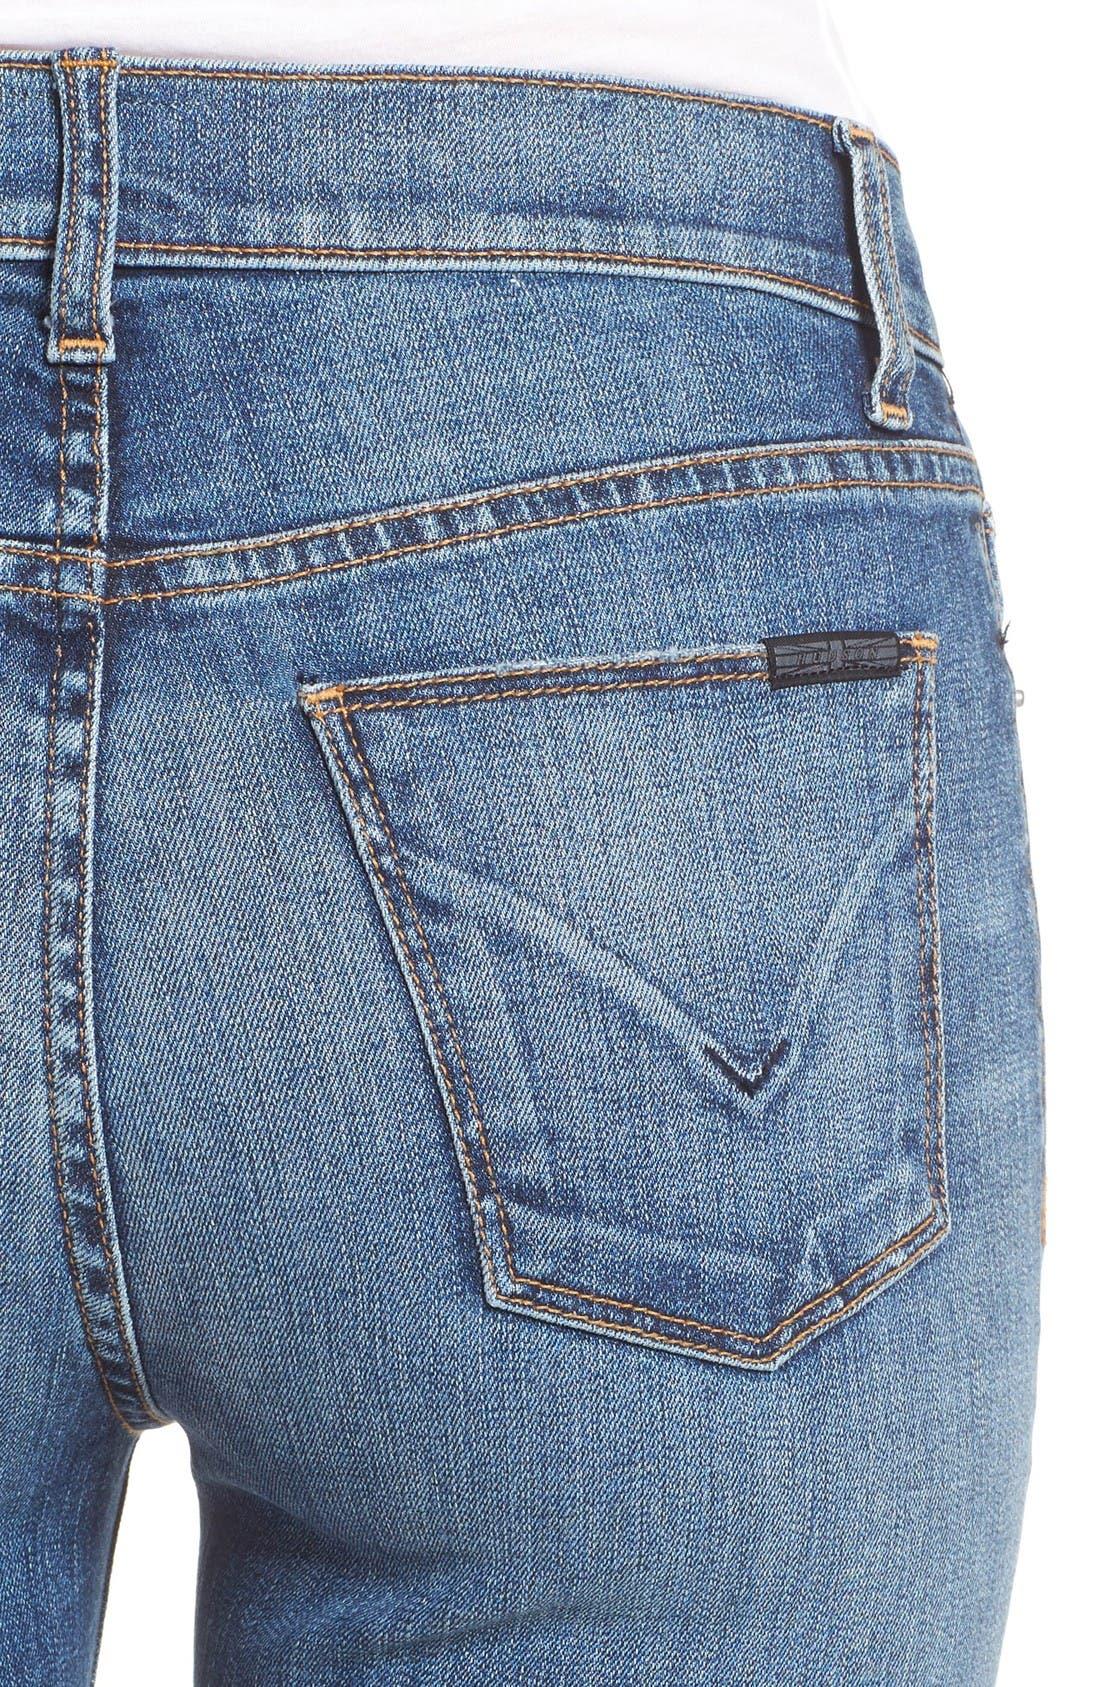 Alternate Image 4  - Hudson Jeans Harper High Waist Crop Flare Jeans (Lifeline)